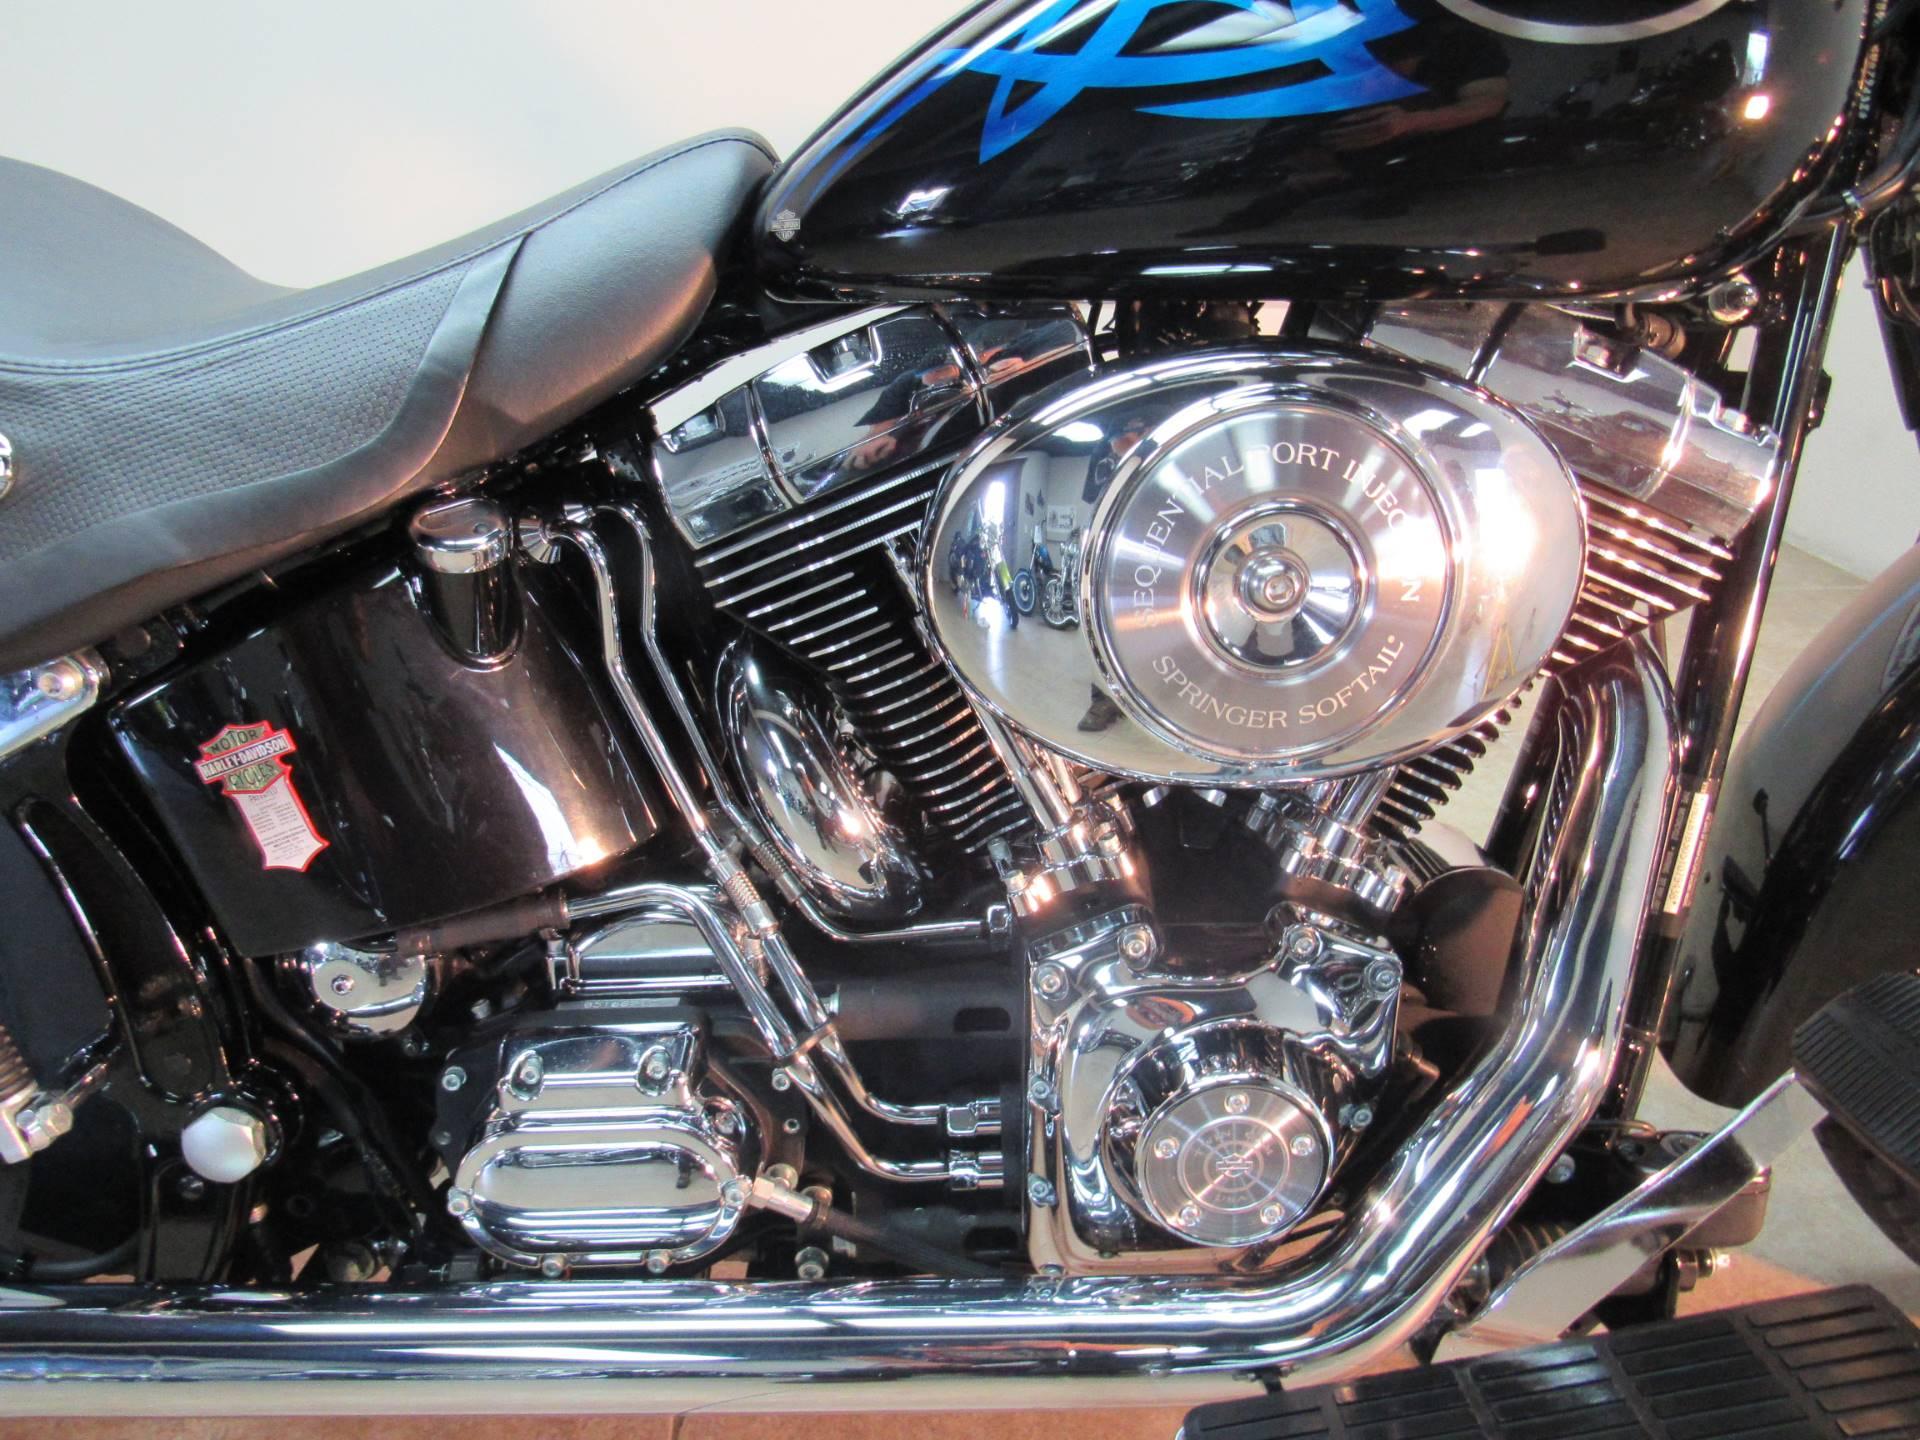 2005 Harley-Davidson FLSTSC/FLSTSCI Softail Springer Classic 9